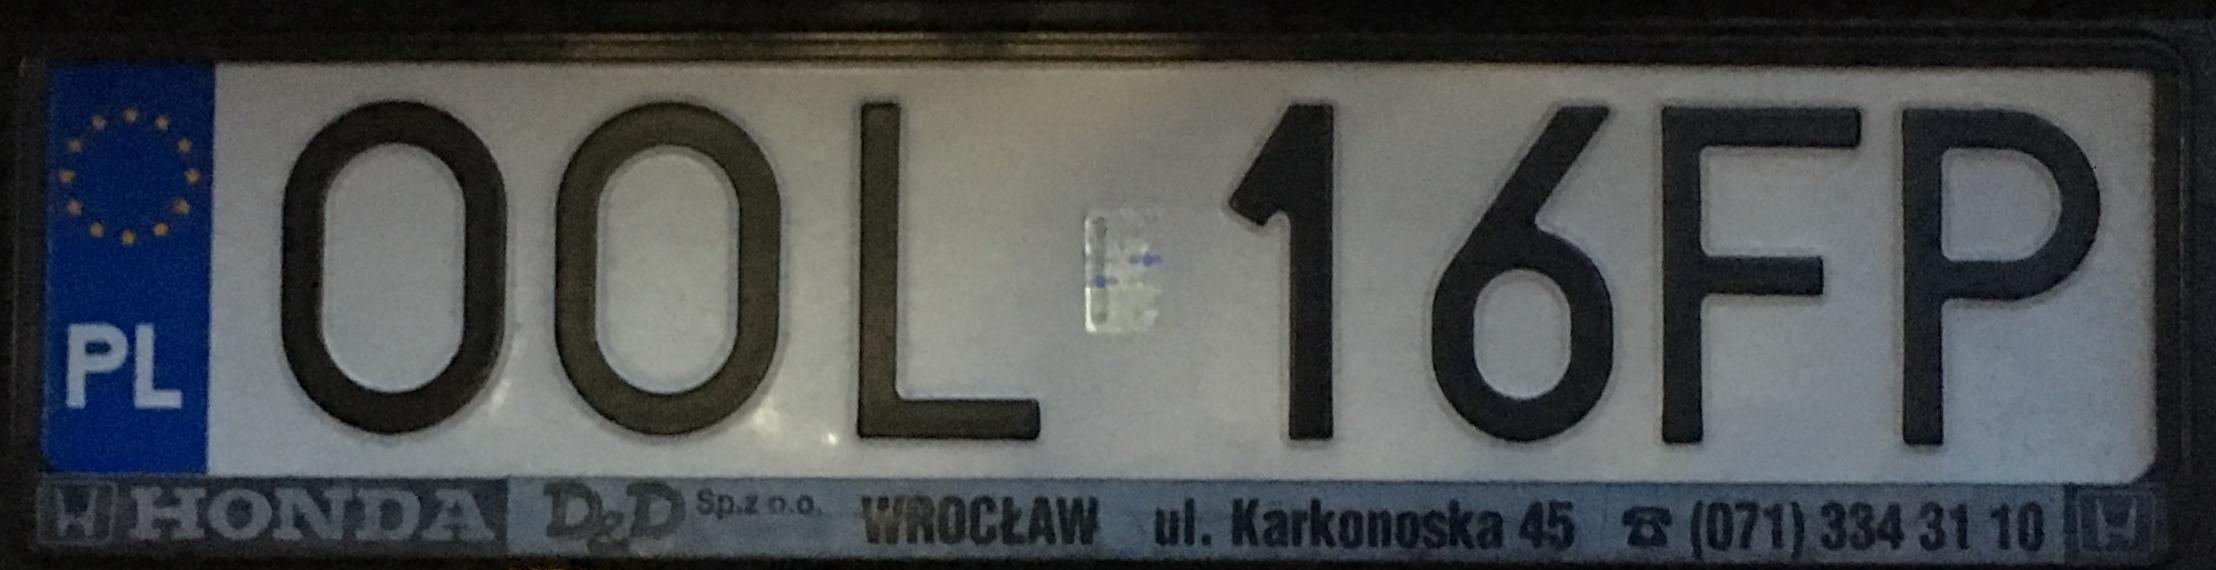 Registrační značka Polsko - OOL - Olesno, foto: www.podalnici.cz